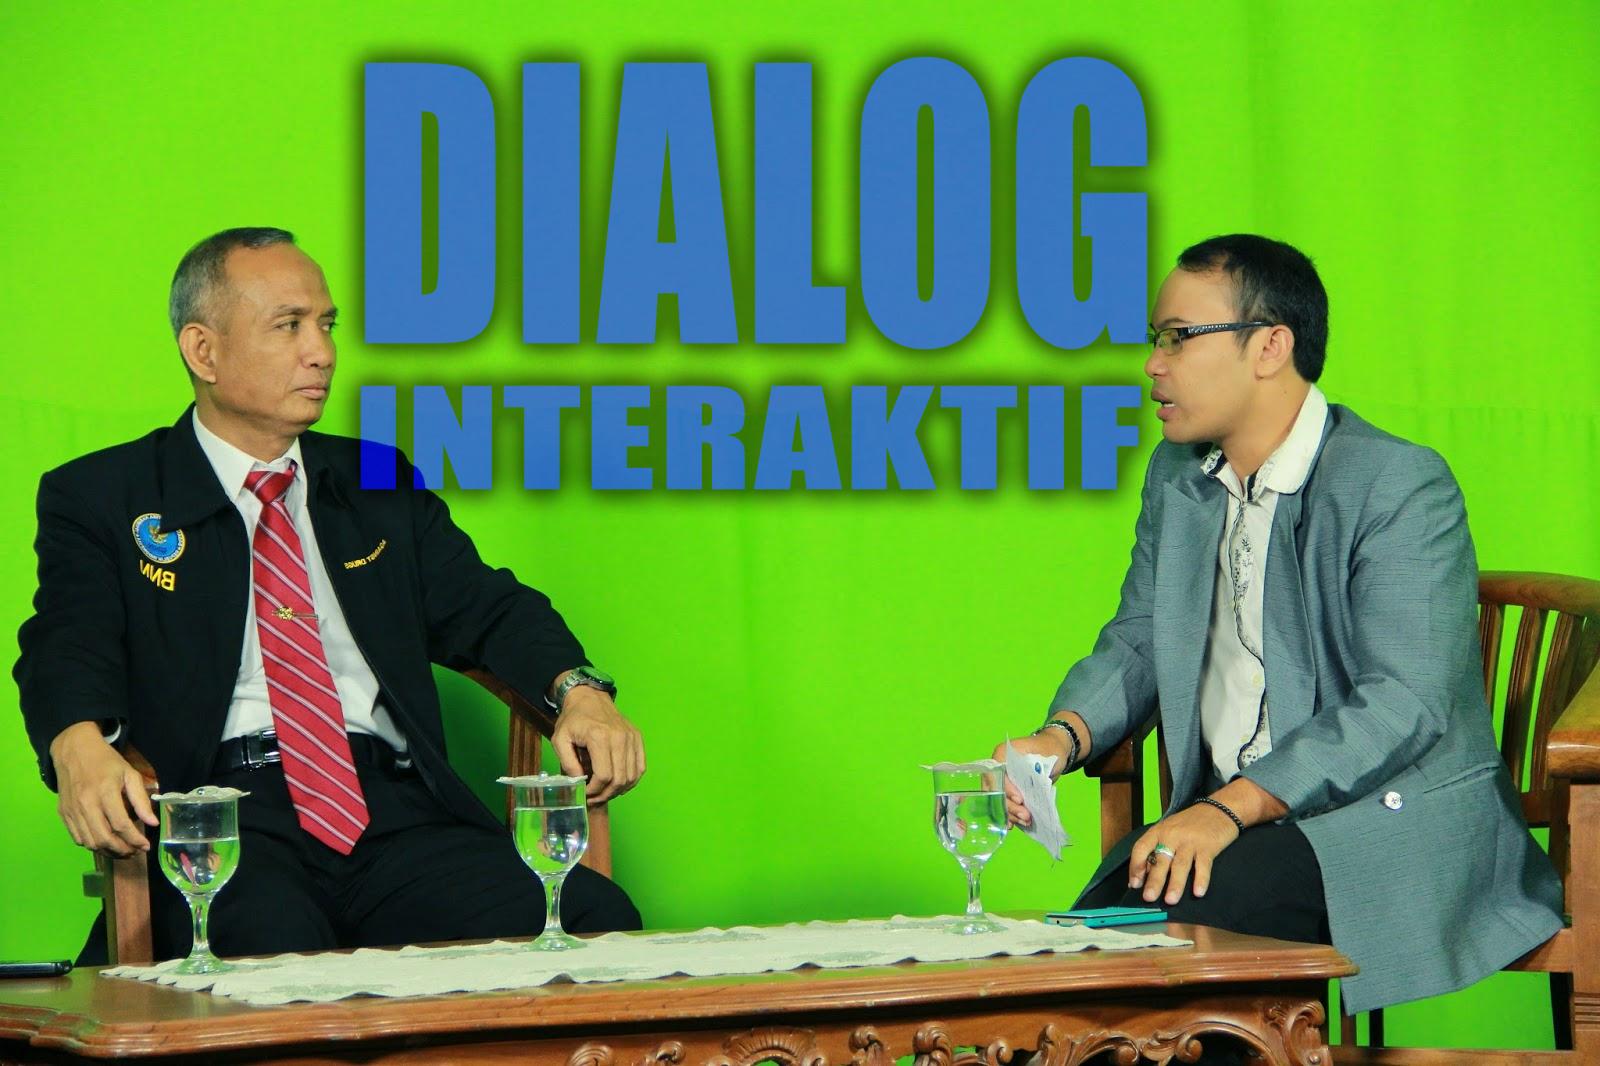 Menyimpulkan Isi Dialog Interaktif Beberapa Narasumber Pada Tayangan